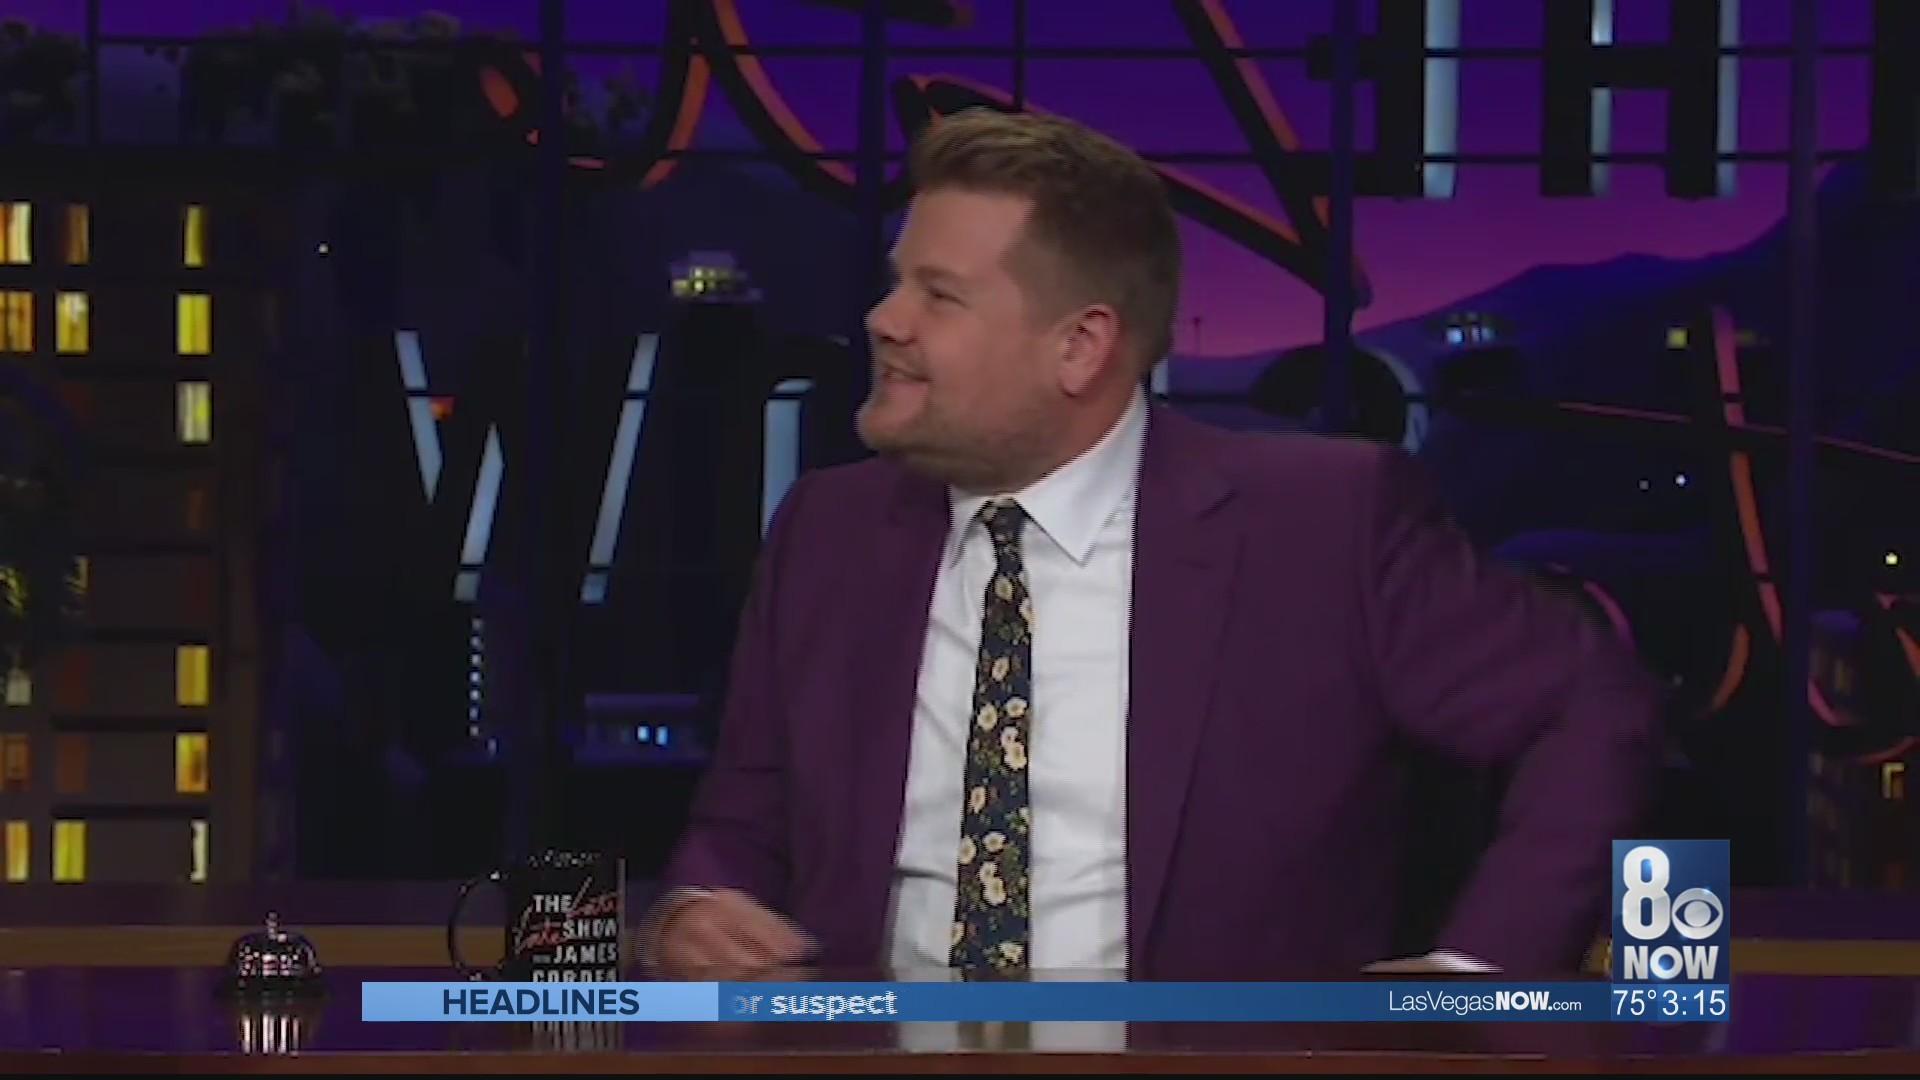 James Corden discusses his recent stint in Vegas